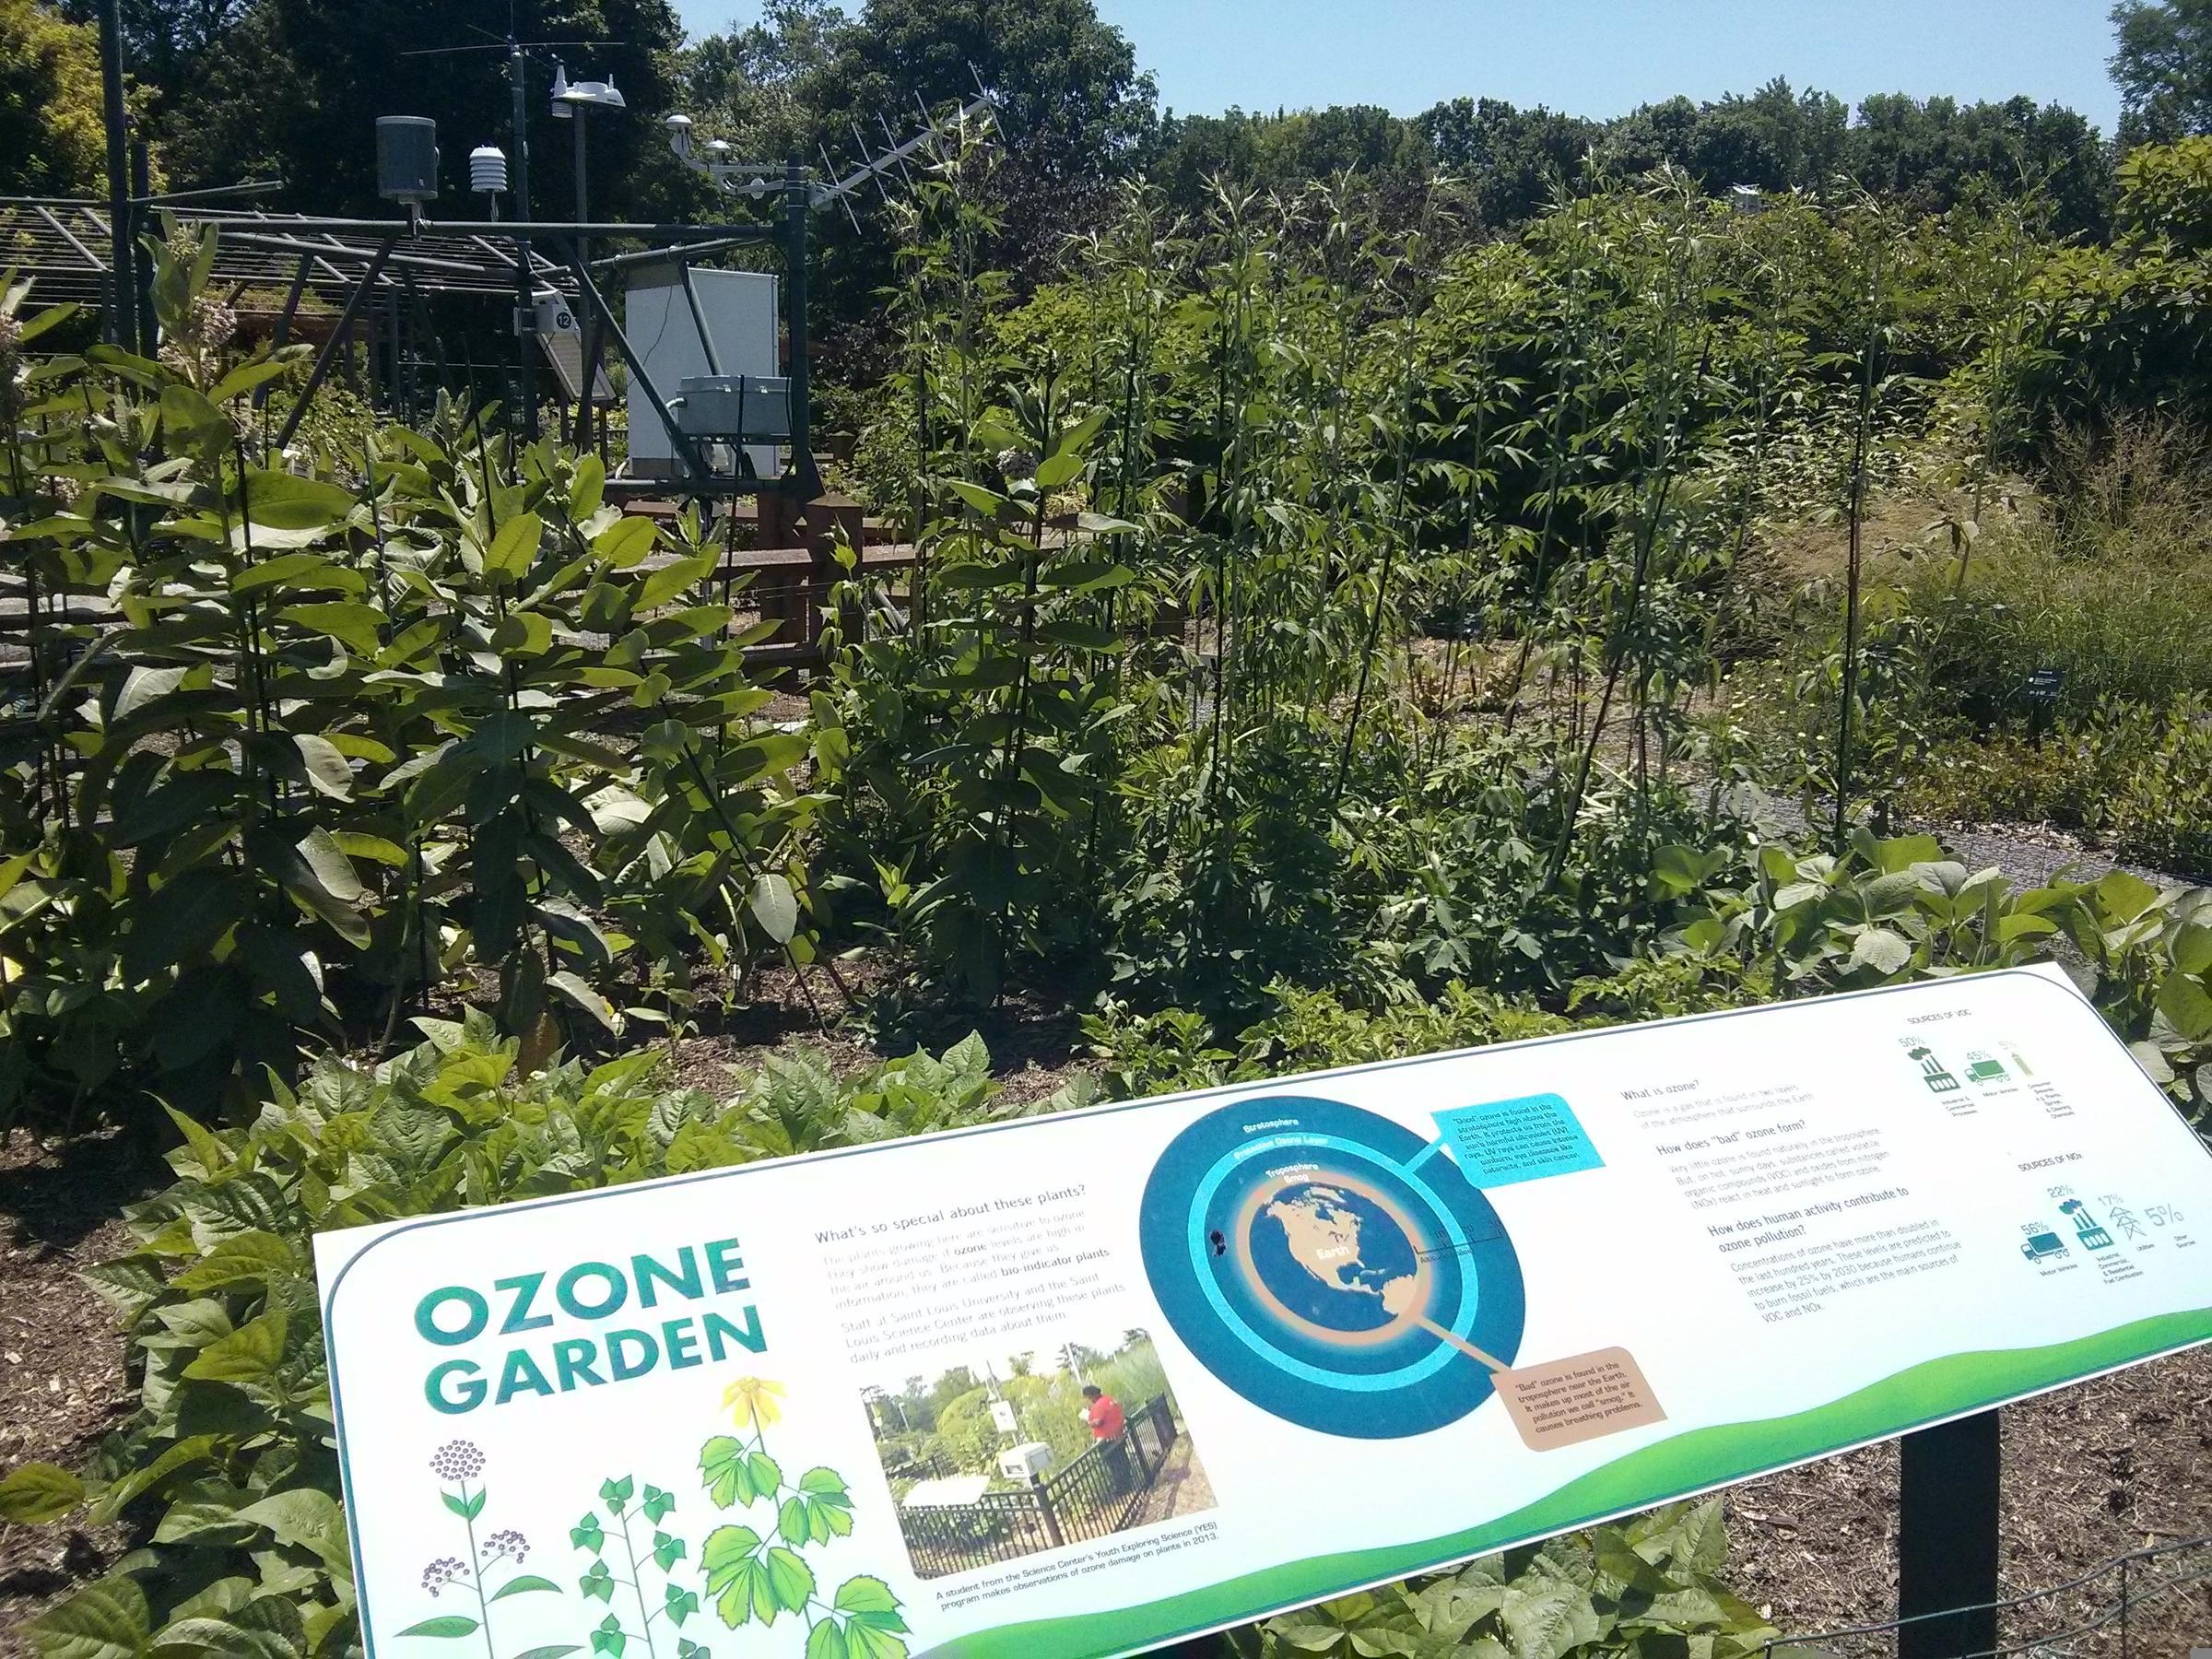 SLU researchers build displays to show how ozone affects plants